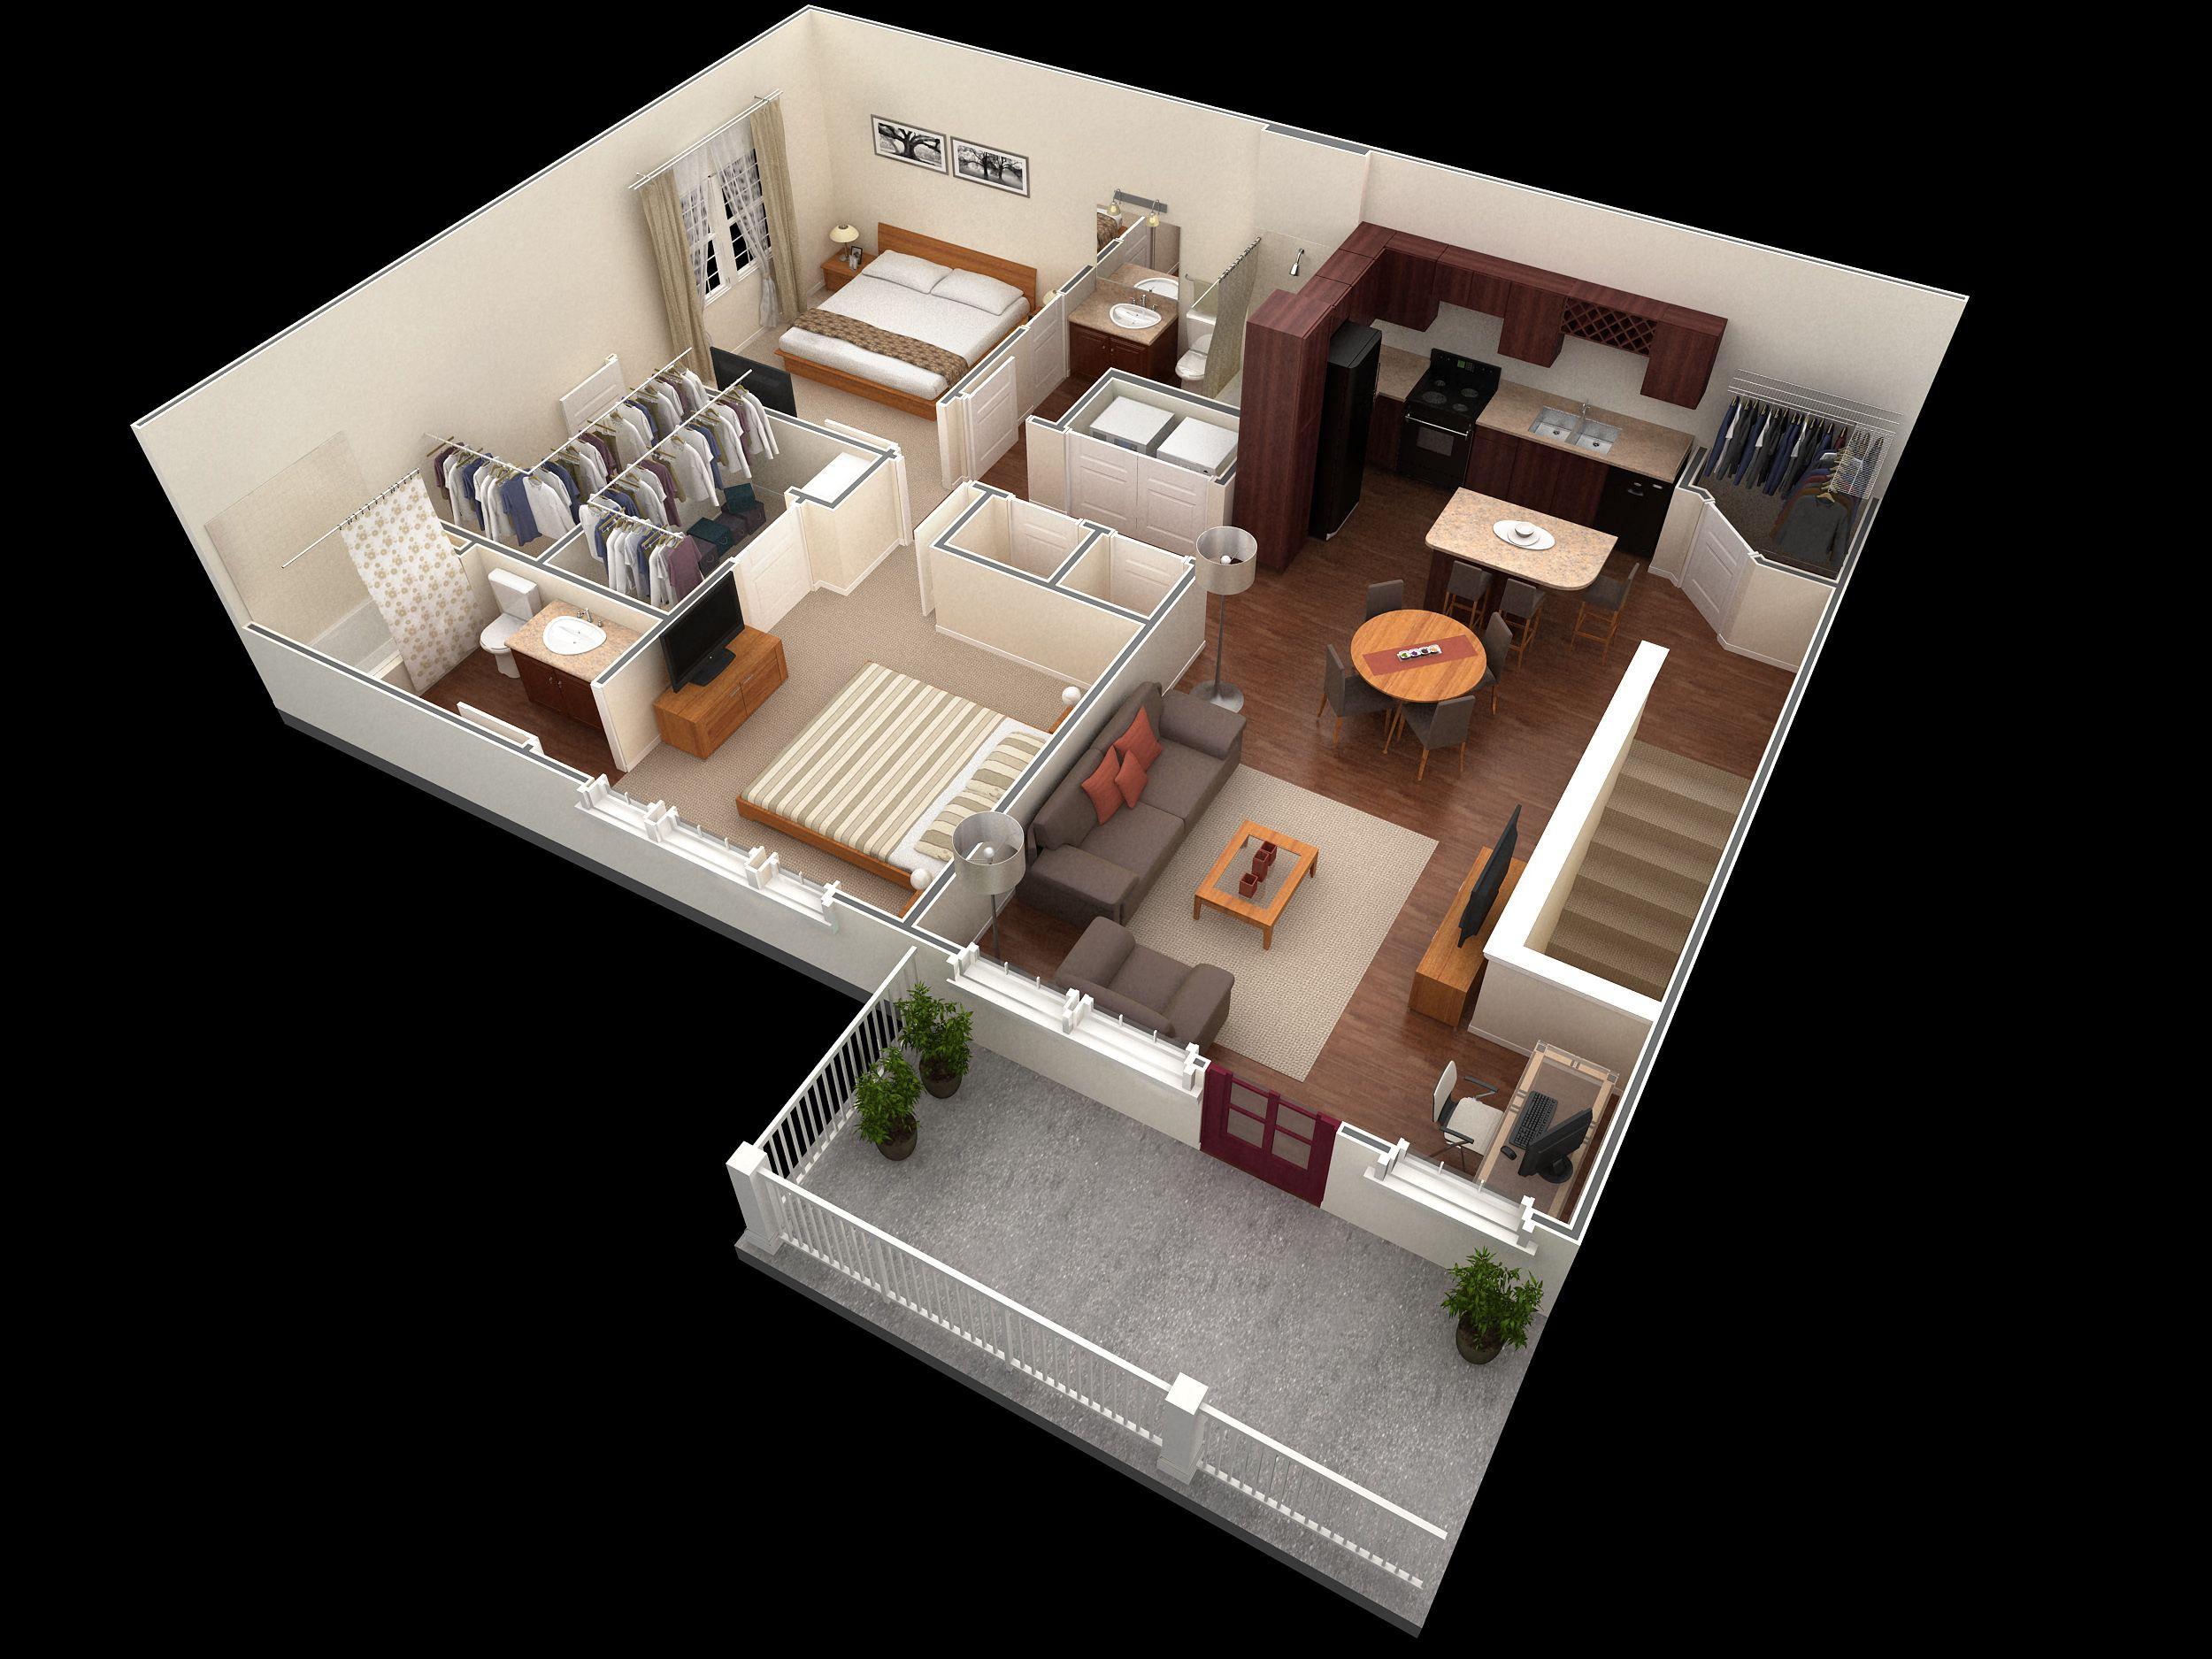 Small 2 Bedroom Apartment 2 Bedroom Designer Overlook Apartment 2 Bedroom 2 Bath 1152 Sf